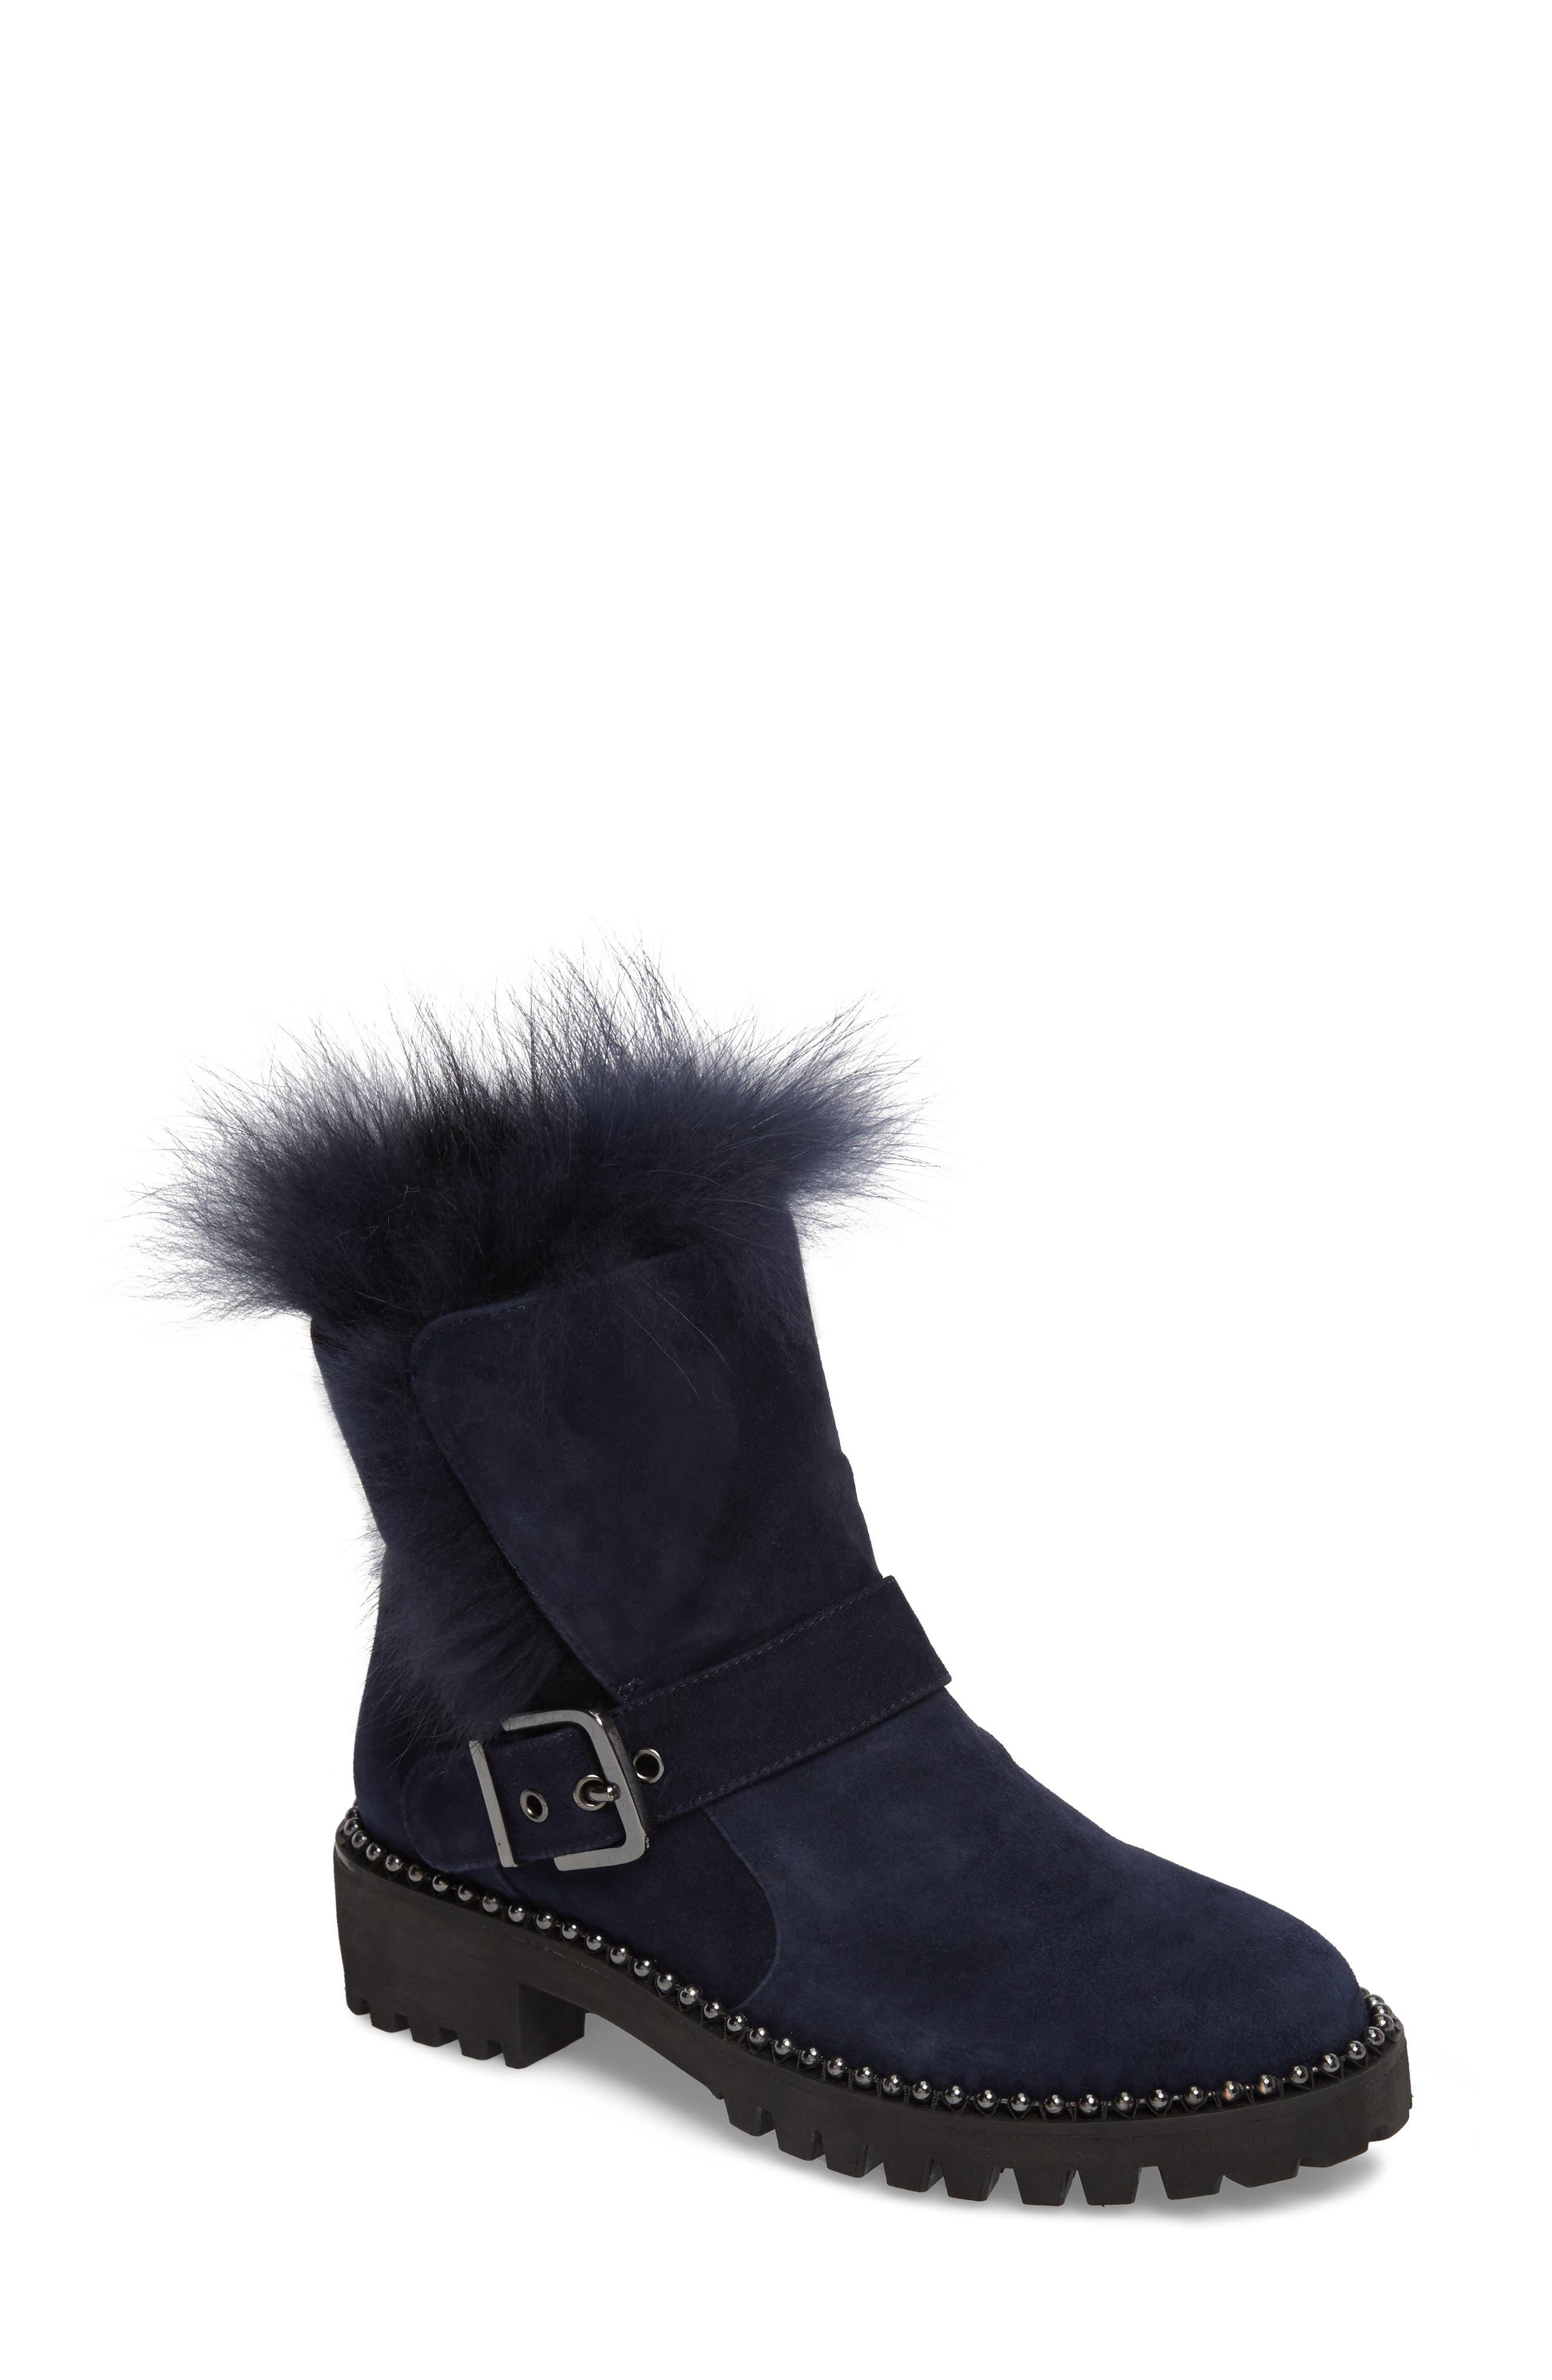 Main Image - Cecelia New York Theresa Boot with Genuine Fox Fur Trim (Women)